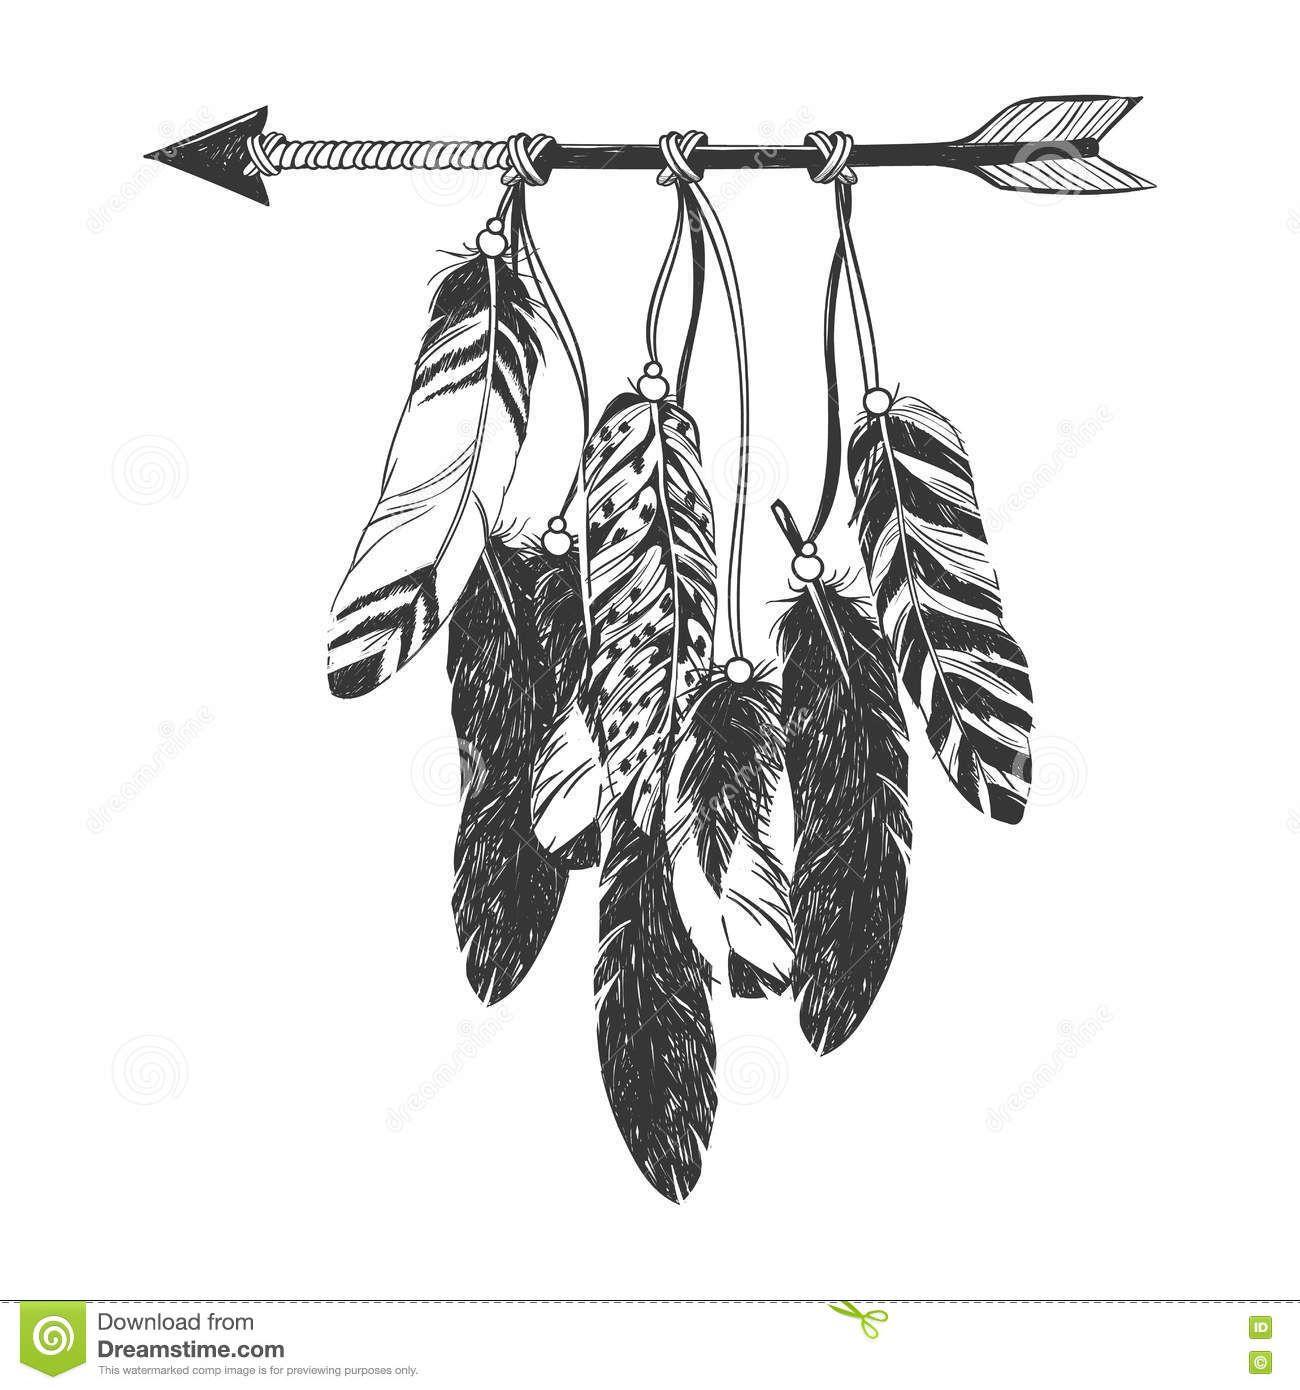 nativeamericanindiandreamcatcherfeathersarrow